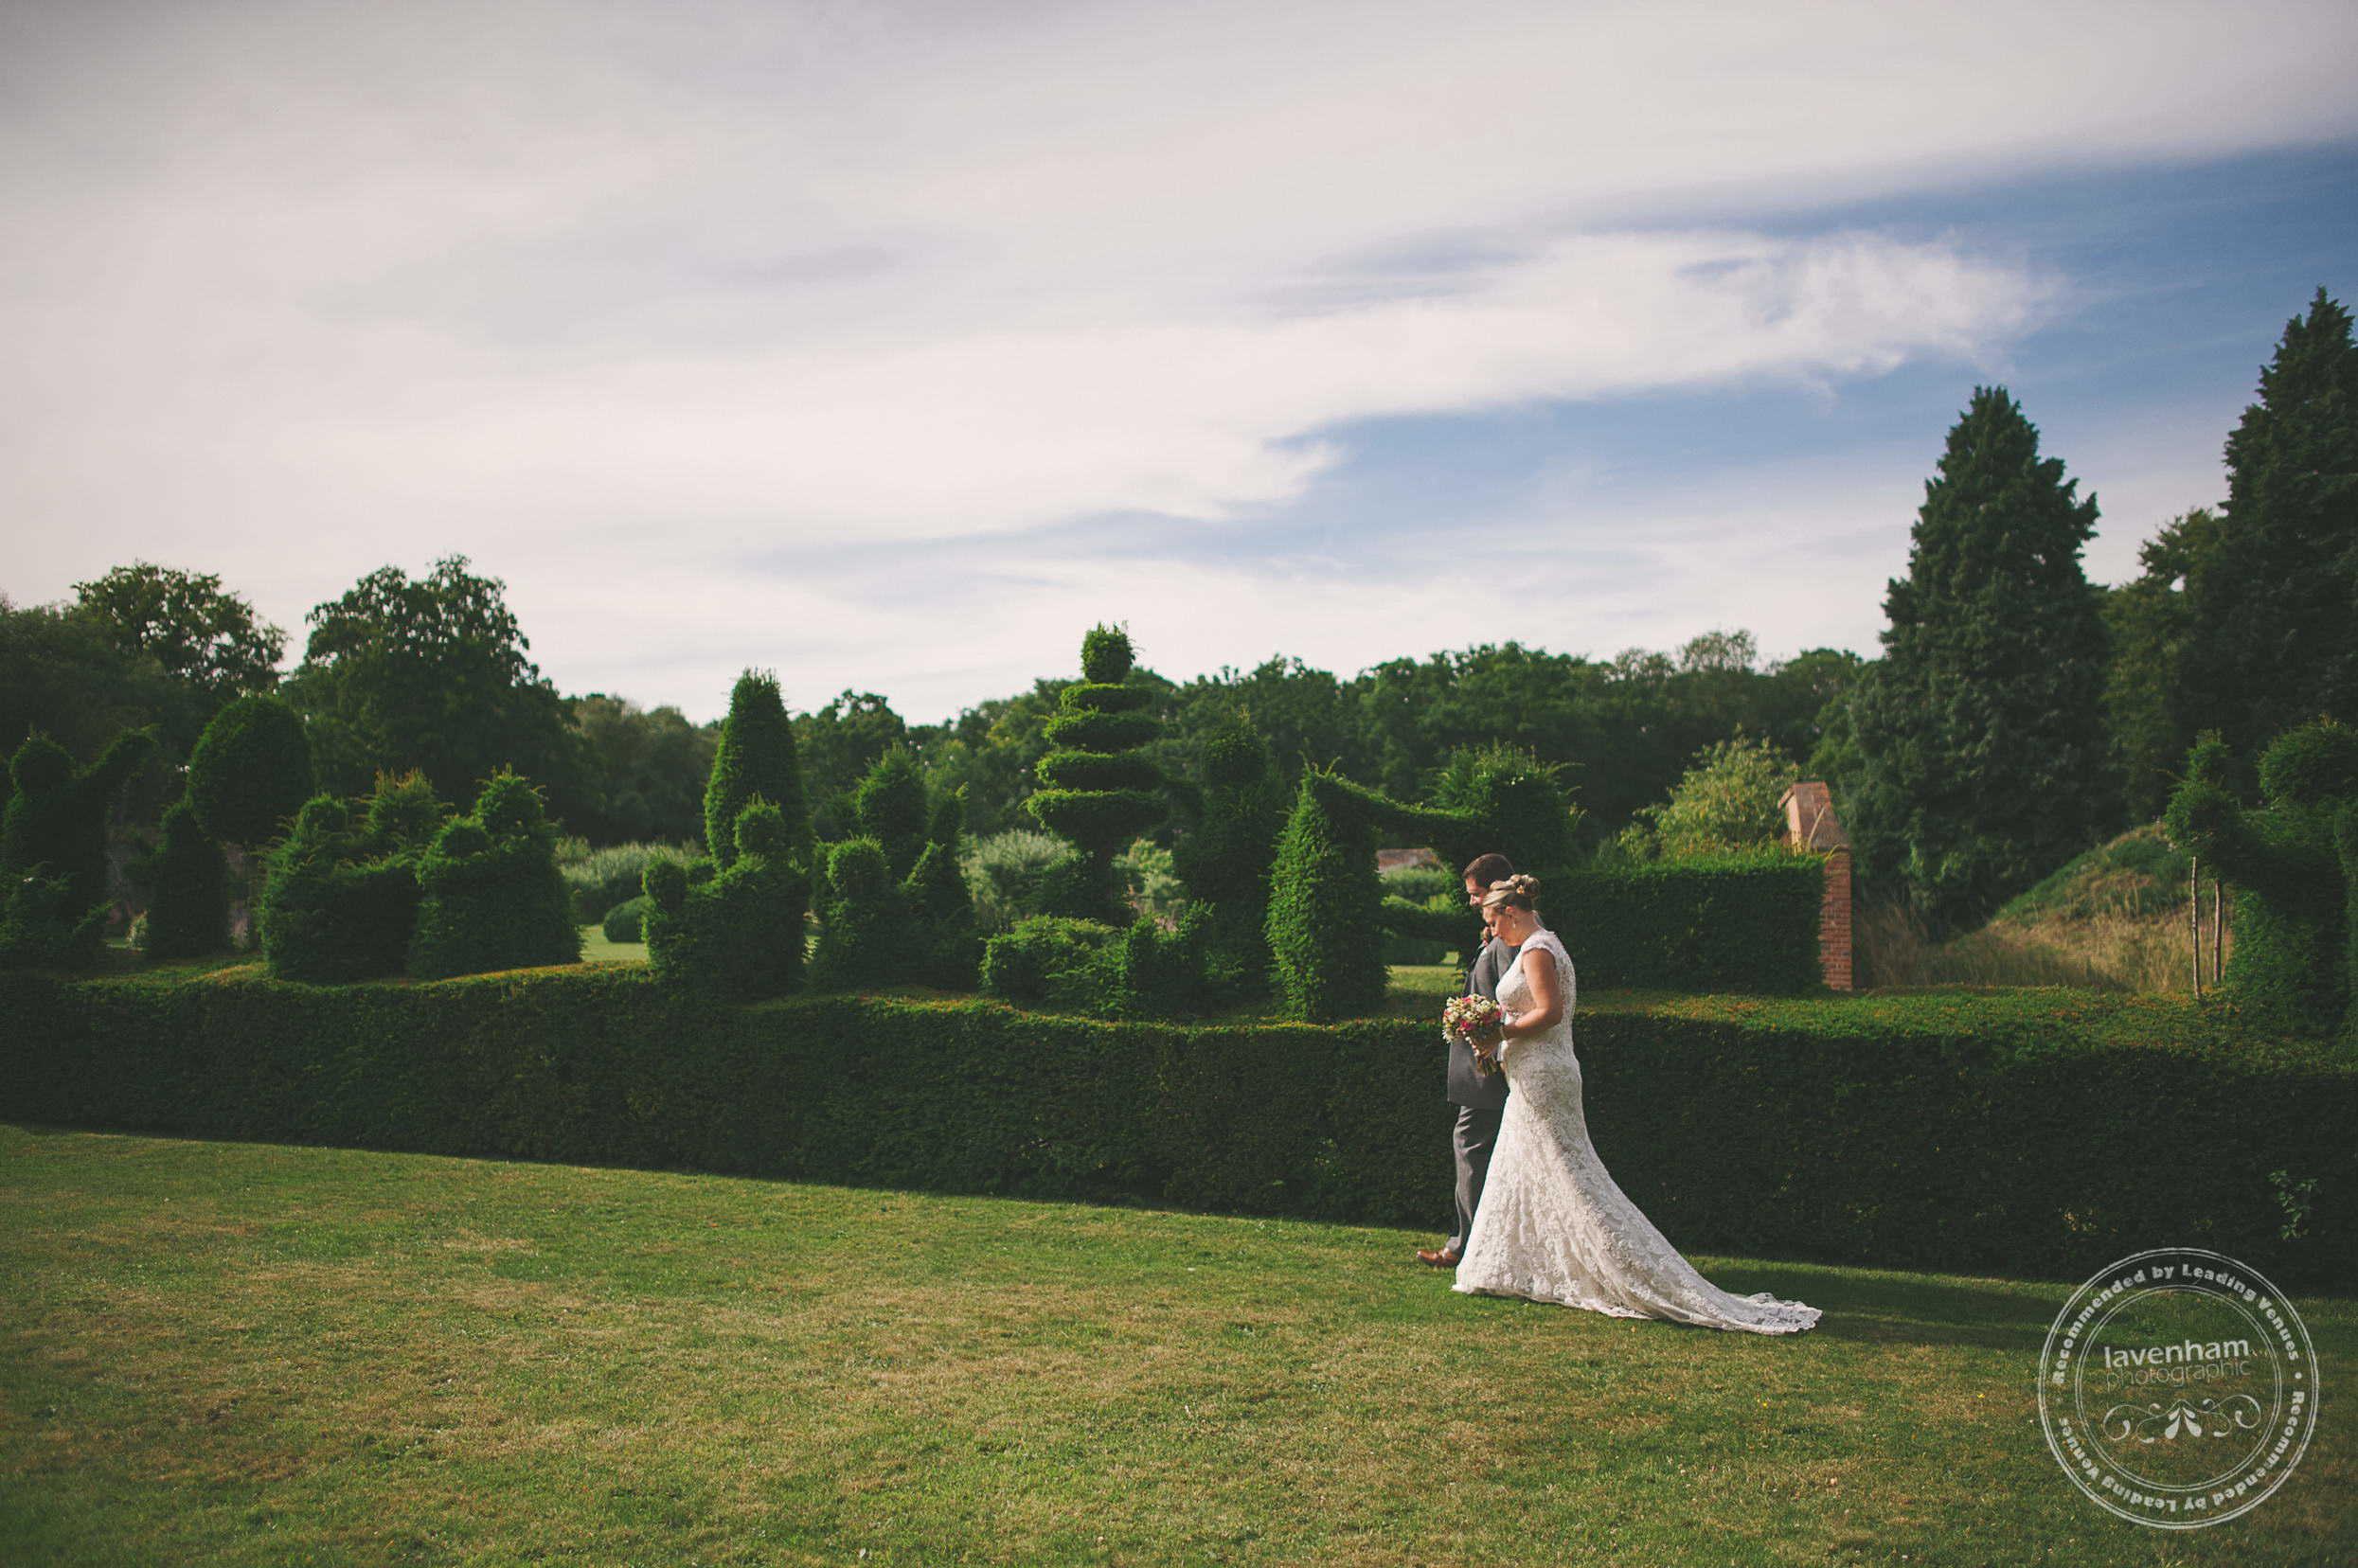 180715-kentwell-hall-wedding-photographer-021